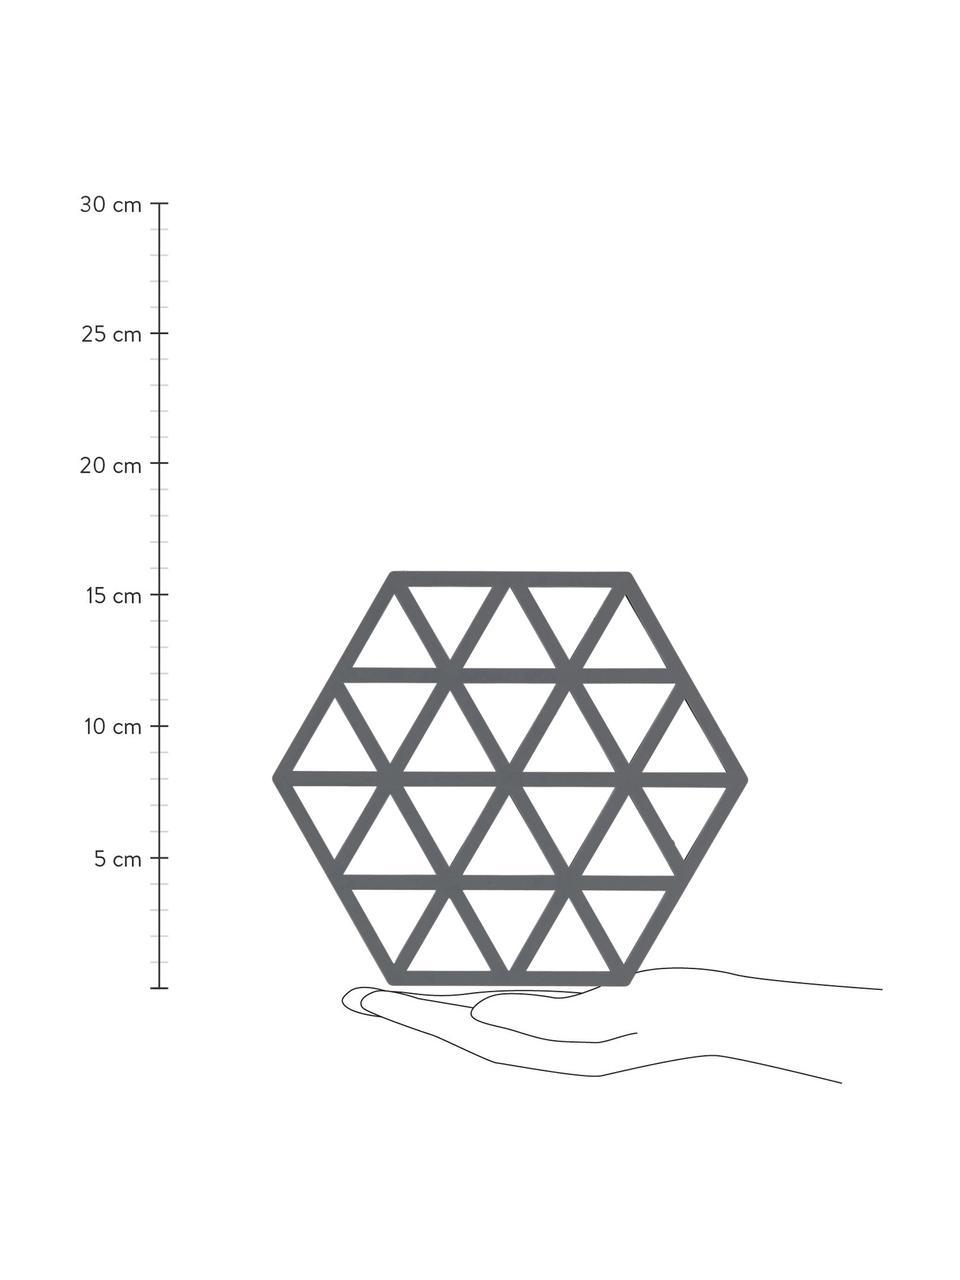 Silikon Topfuntersetzer Triangle in Grau, 2 Stück, Silikon, Grau, 14 x 16 cm